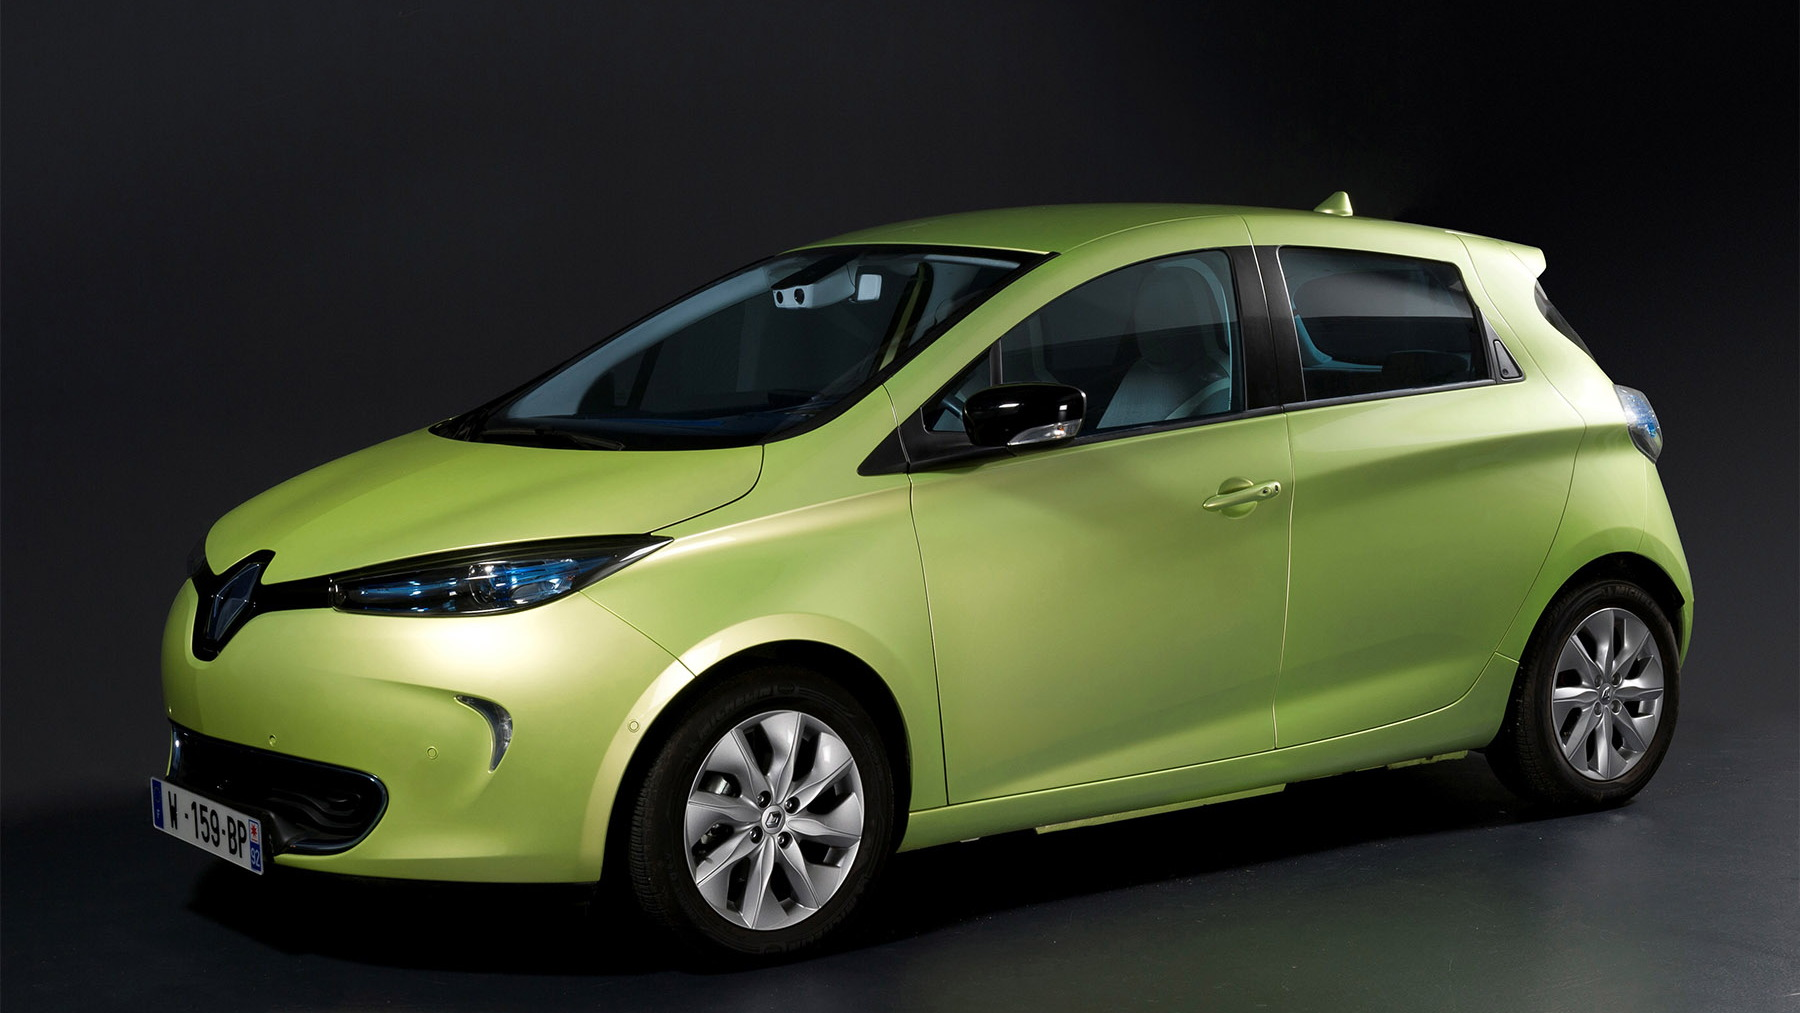 Renault Next Two autonomous and connected car prototype